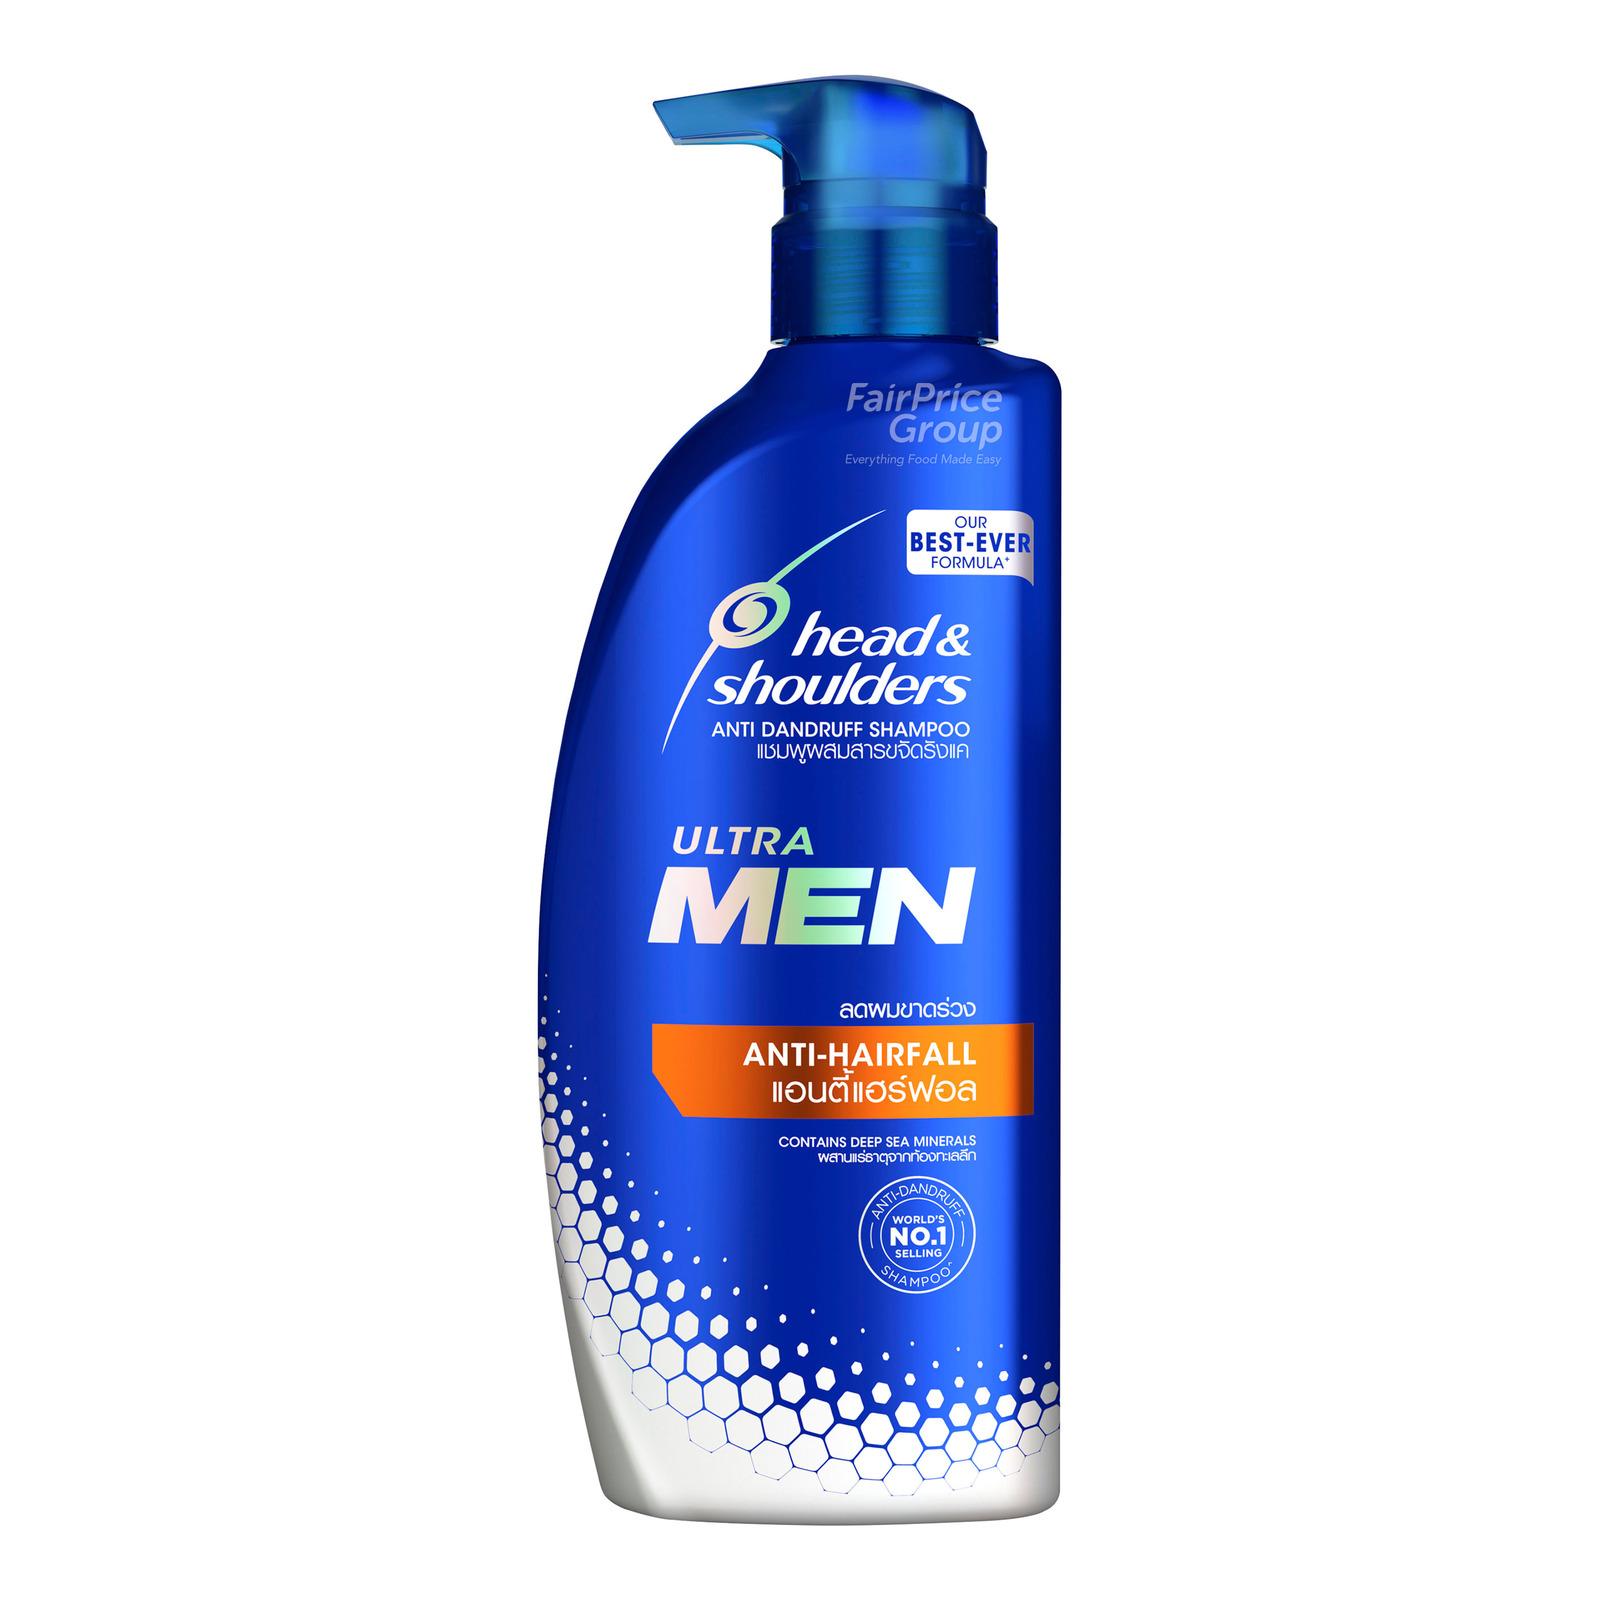 Head & Shoulders Men Ultra Anti-Dandruff Shampoo -Anti-Hairfall